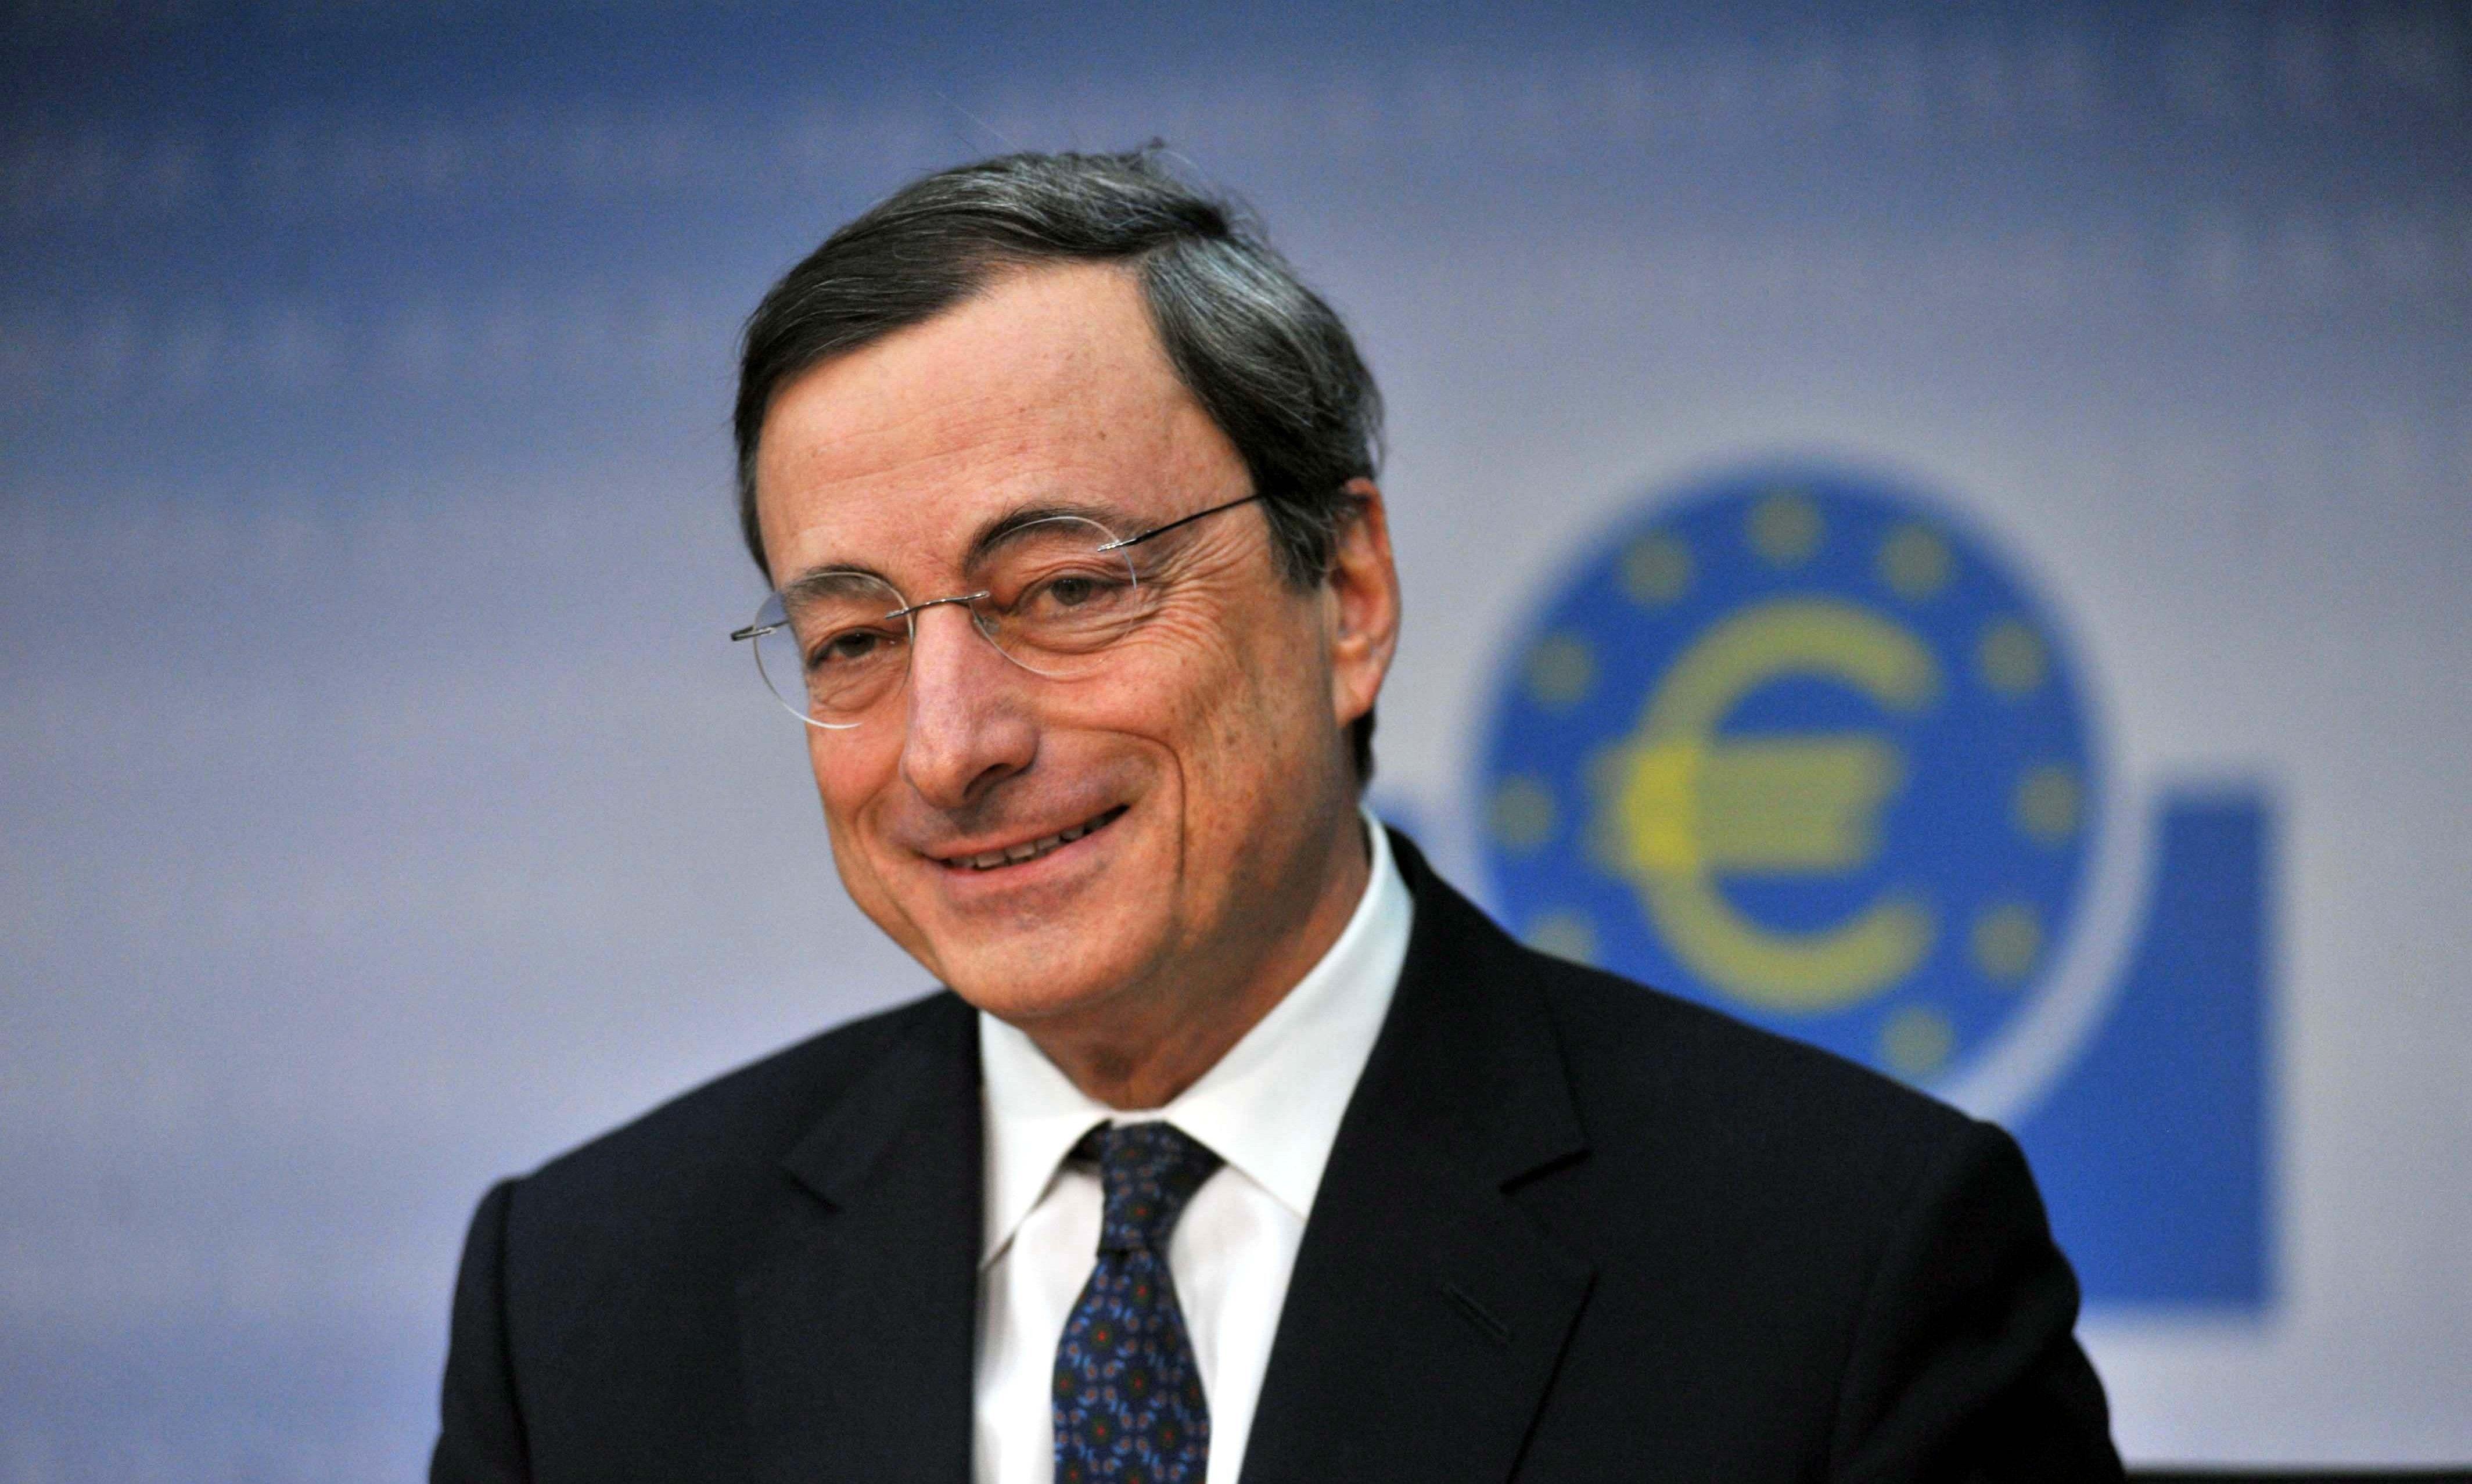 Continuamos con Mario Draghi, Presidente del Banco Central Europeo.